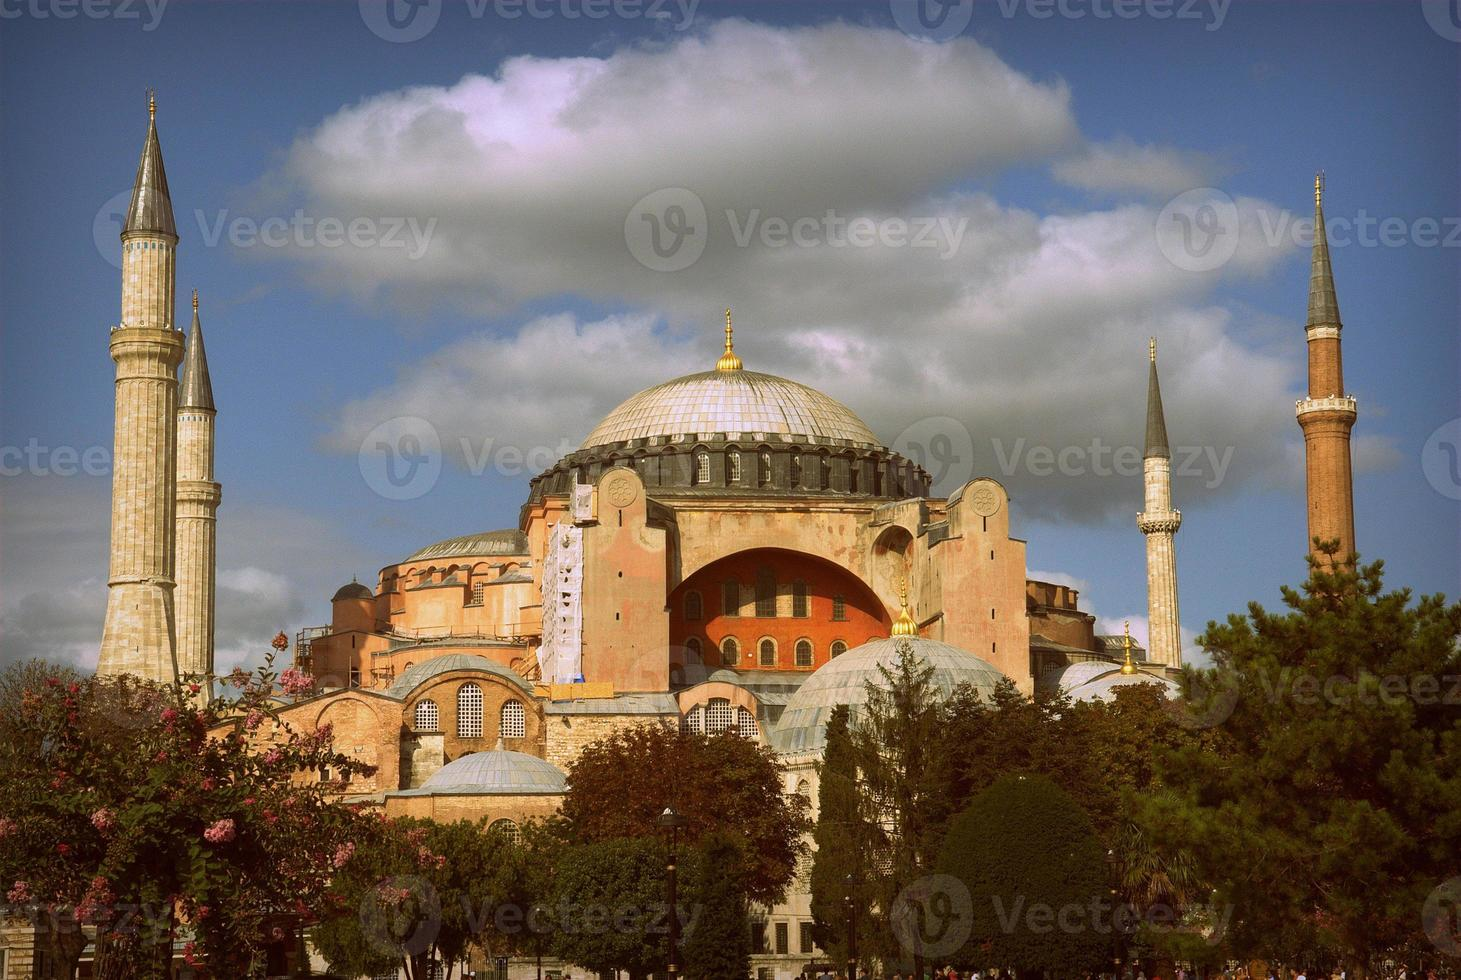 buitenkant van de Hagia Sophia in Sultanahmet foto